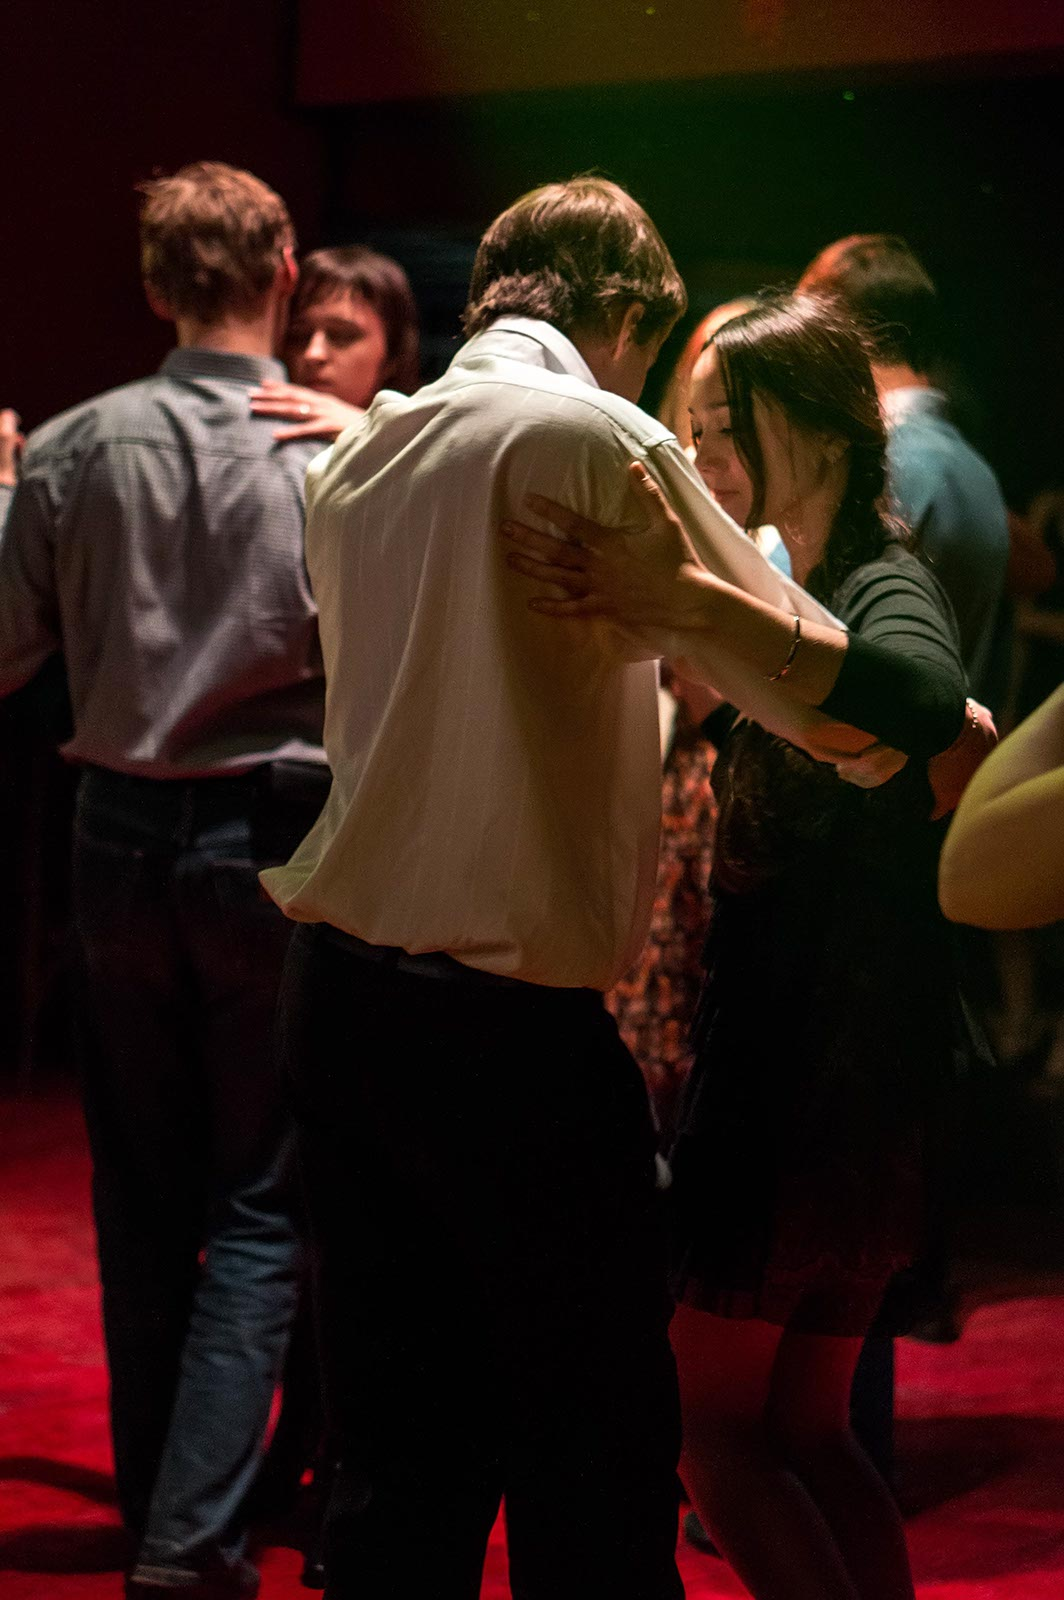 Фото №120354. Танго. Милонга в кафе «China Town». 11.12.2012, Казань